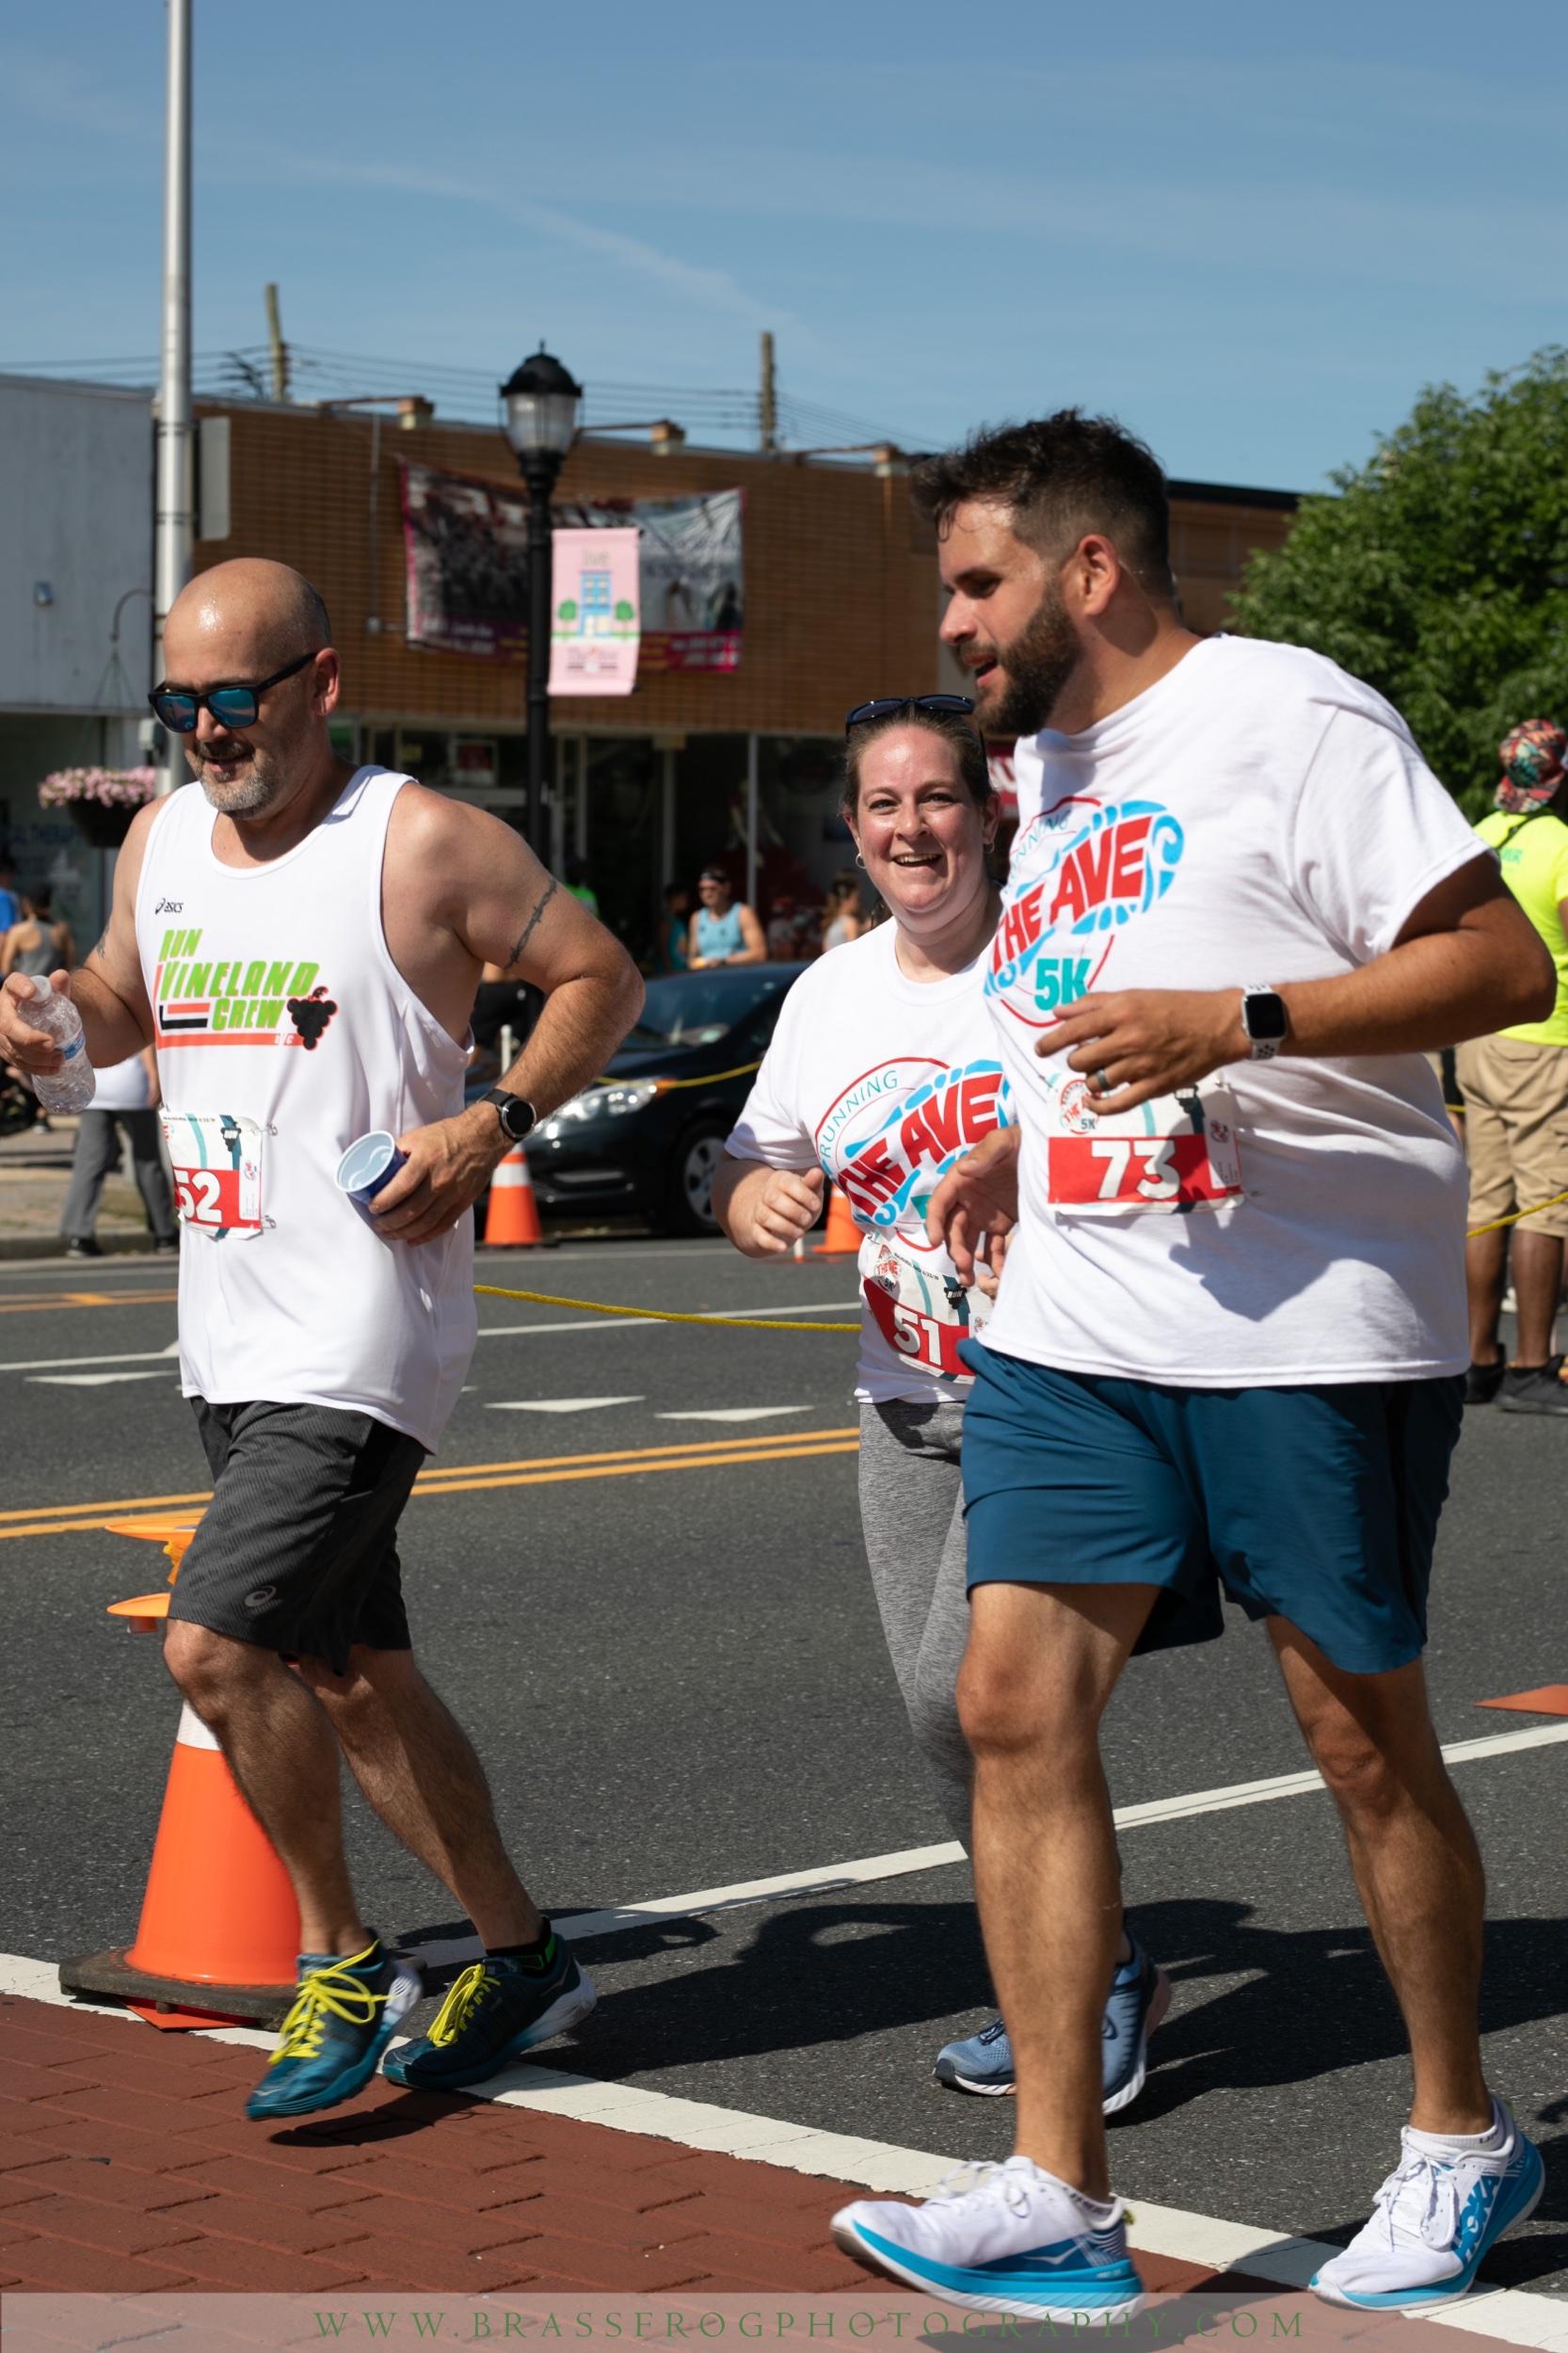 RACE RECAP - RUNNING THE AVE 5K — Second Capital Running